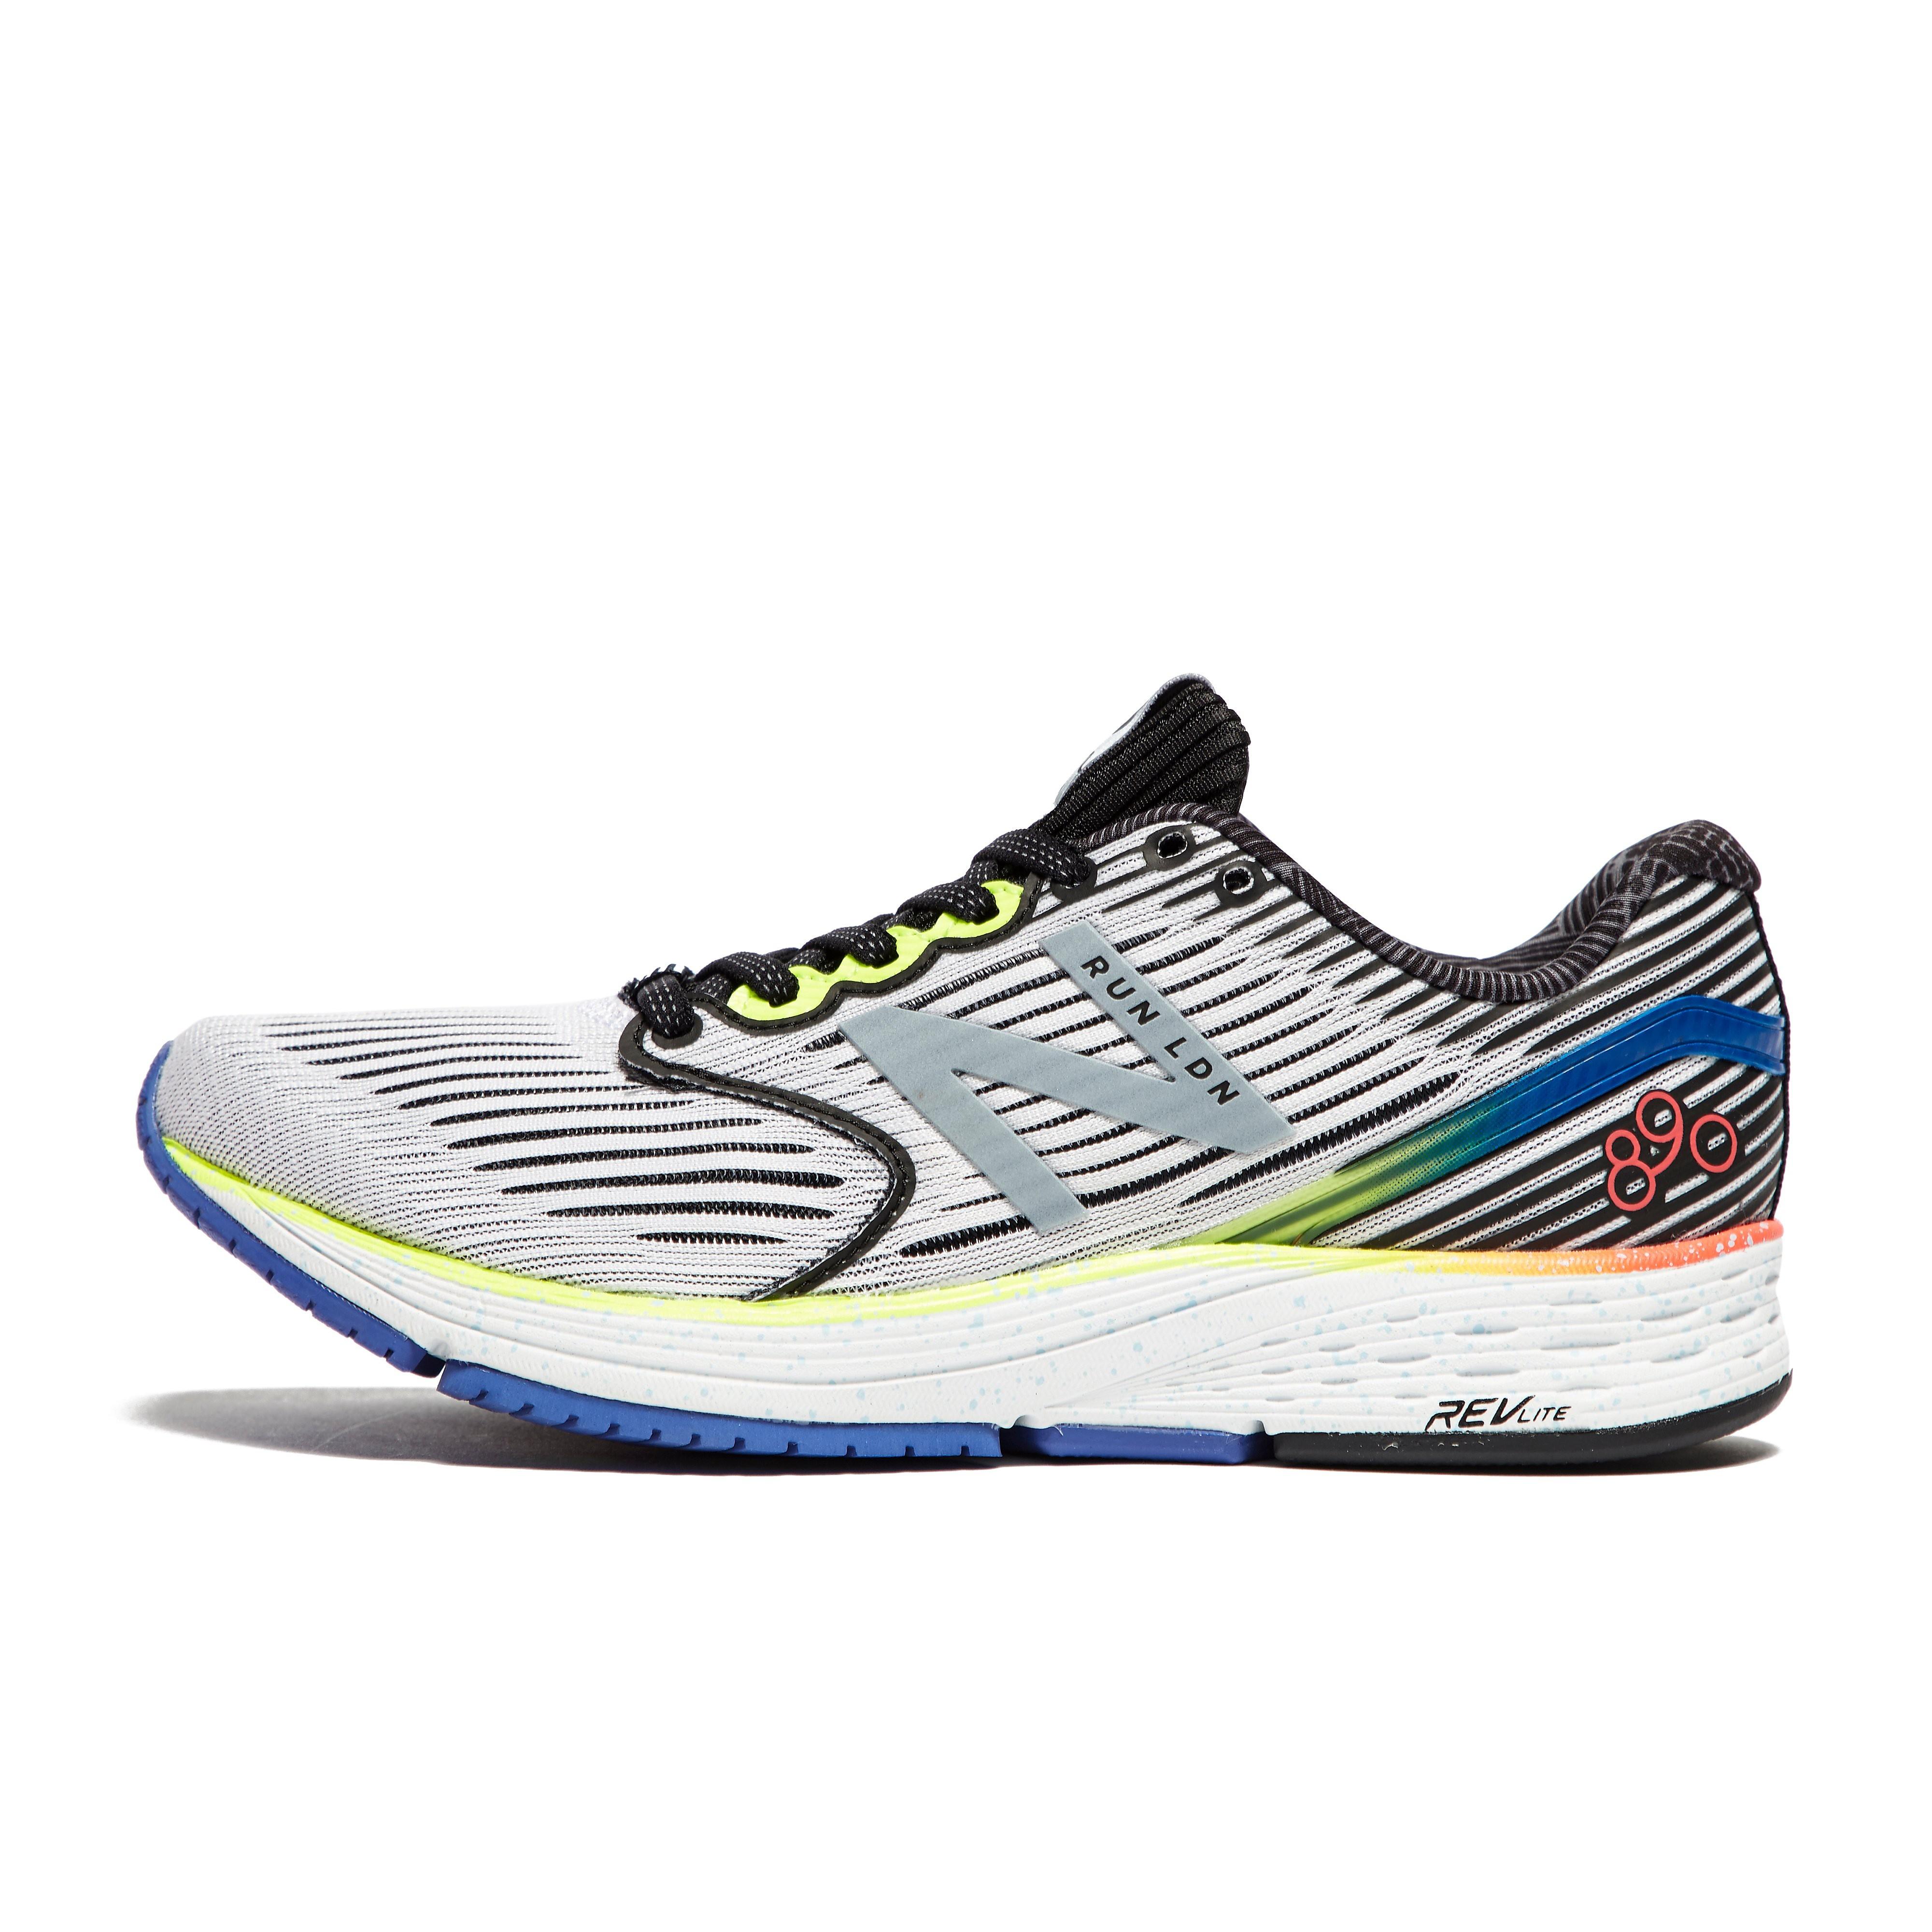 New Balance 890V6 London Marathon Edition Women's Running Shoes